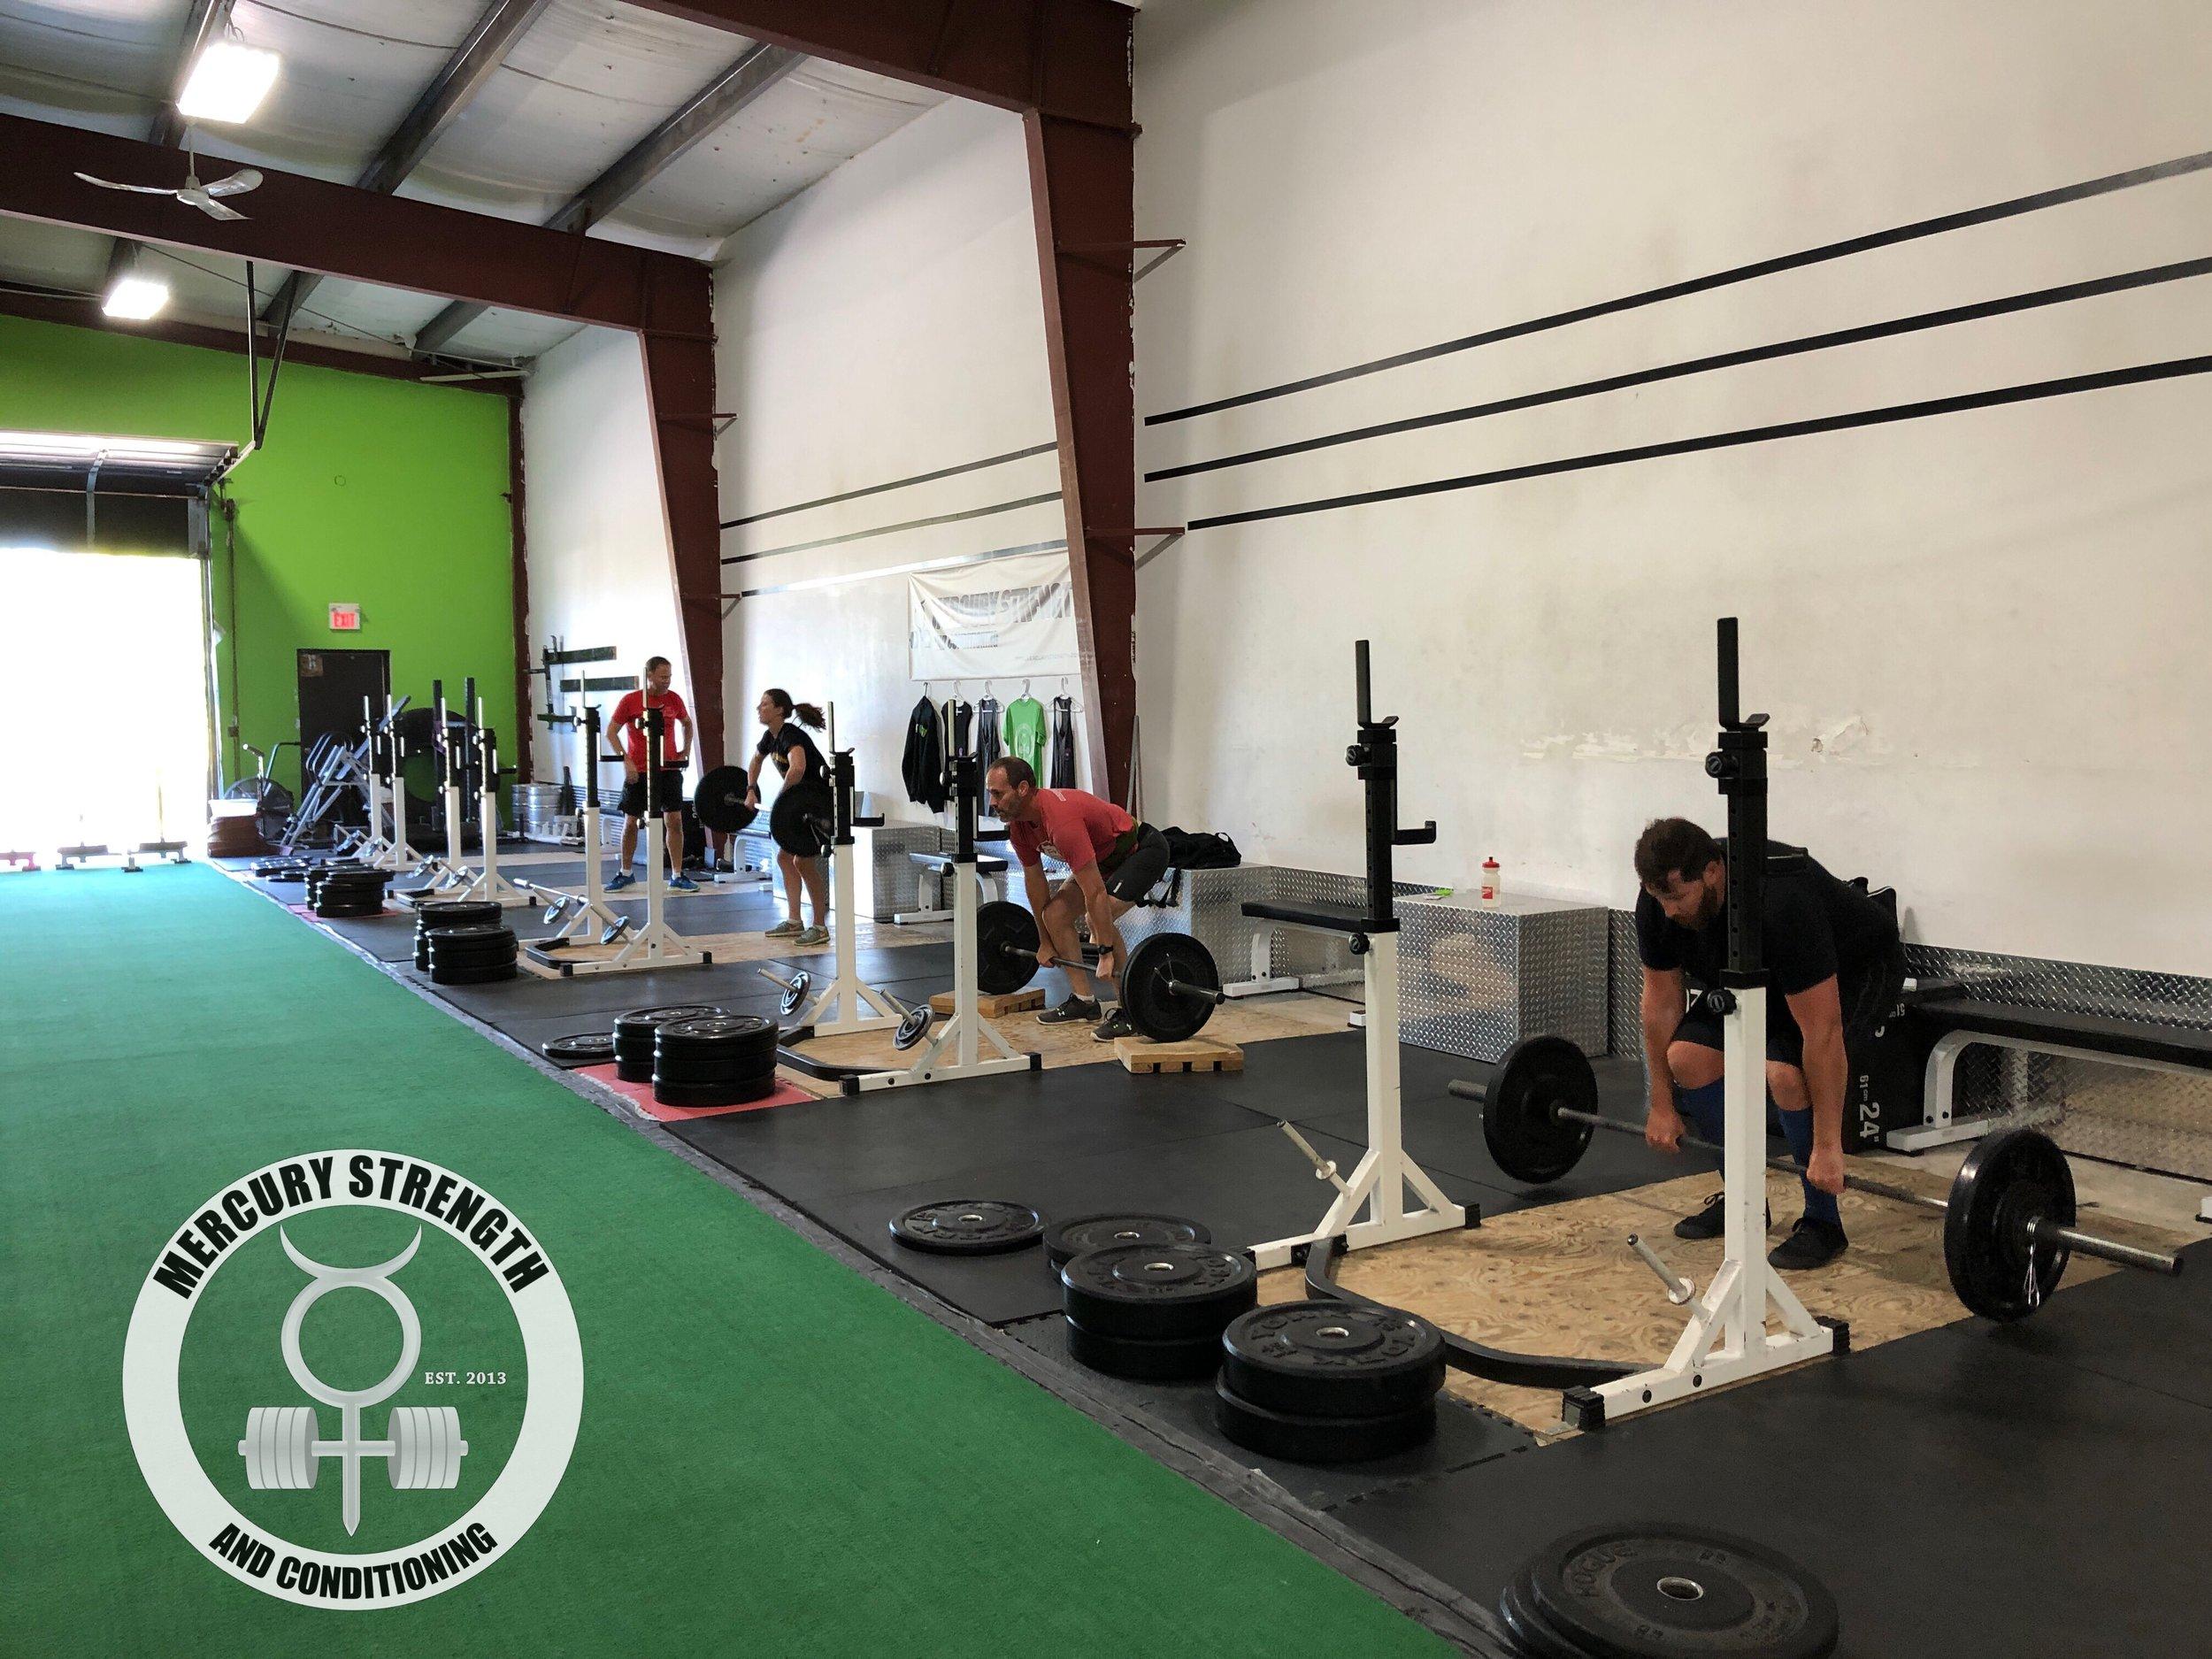 Gym-powerlifting-fitness-personal training-training-bootcamp-crossfit-kingston-kingston gym-kids-mercury-strength-conditioning-athlete-Power Clean.JPG